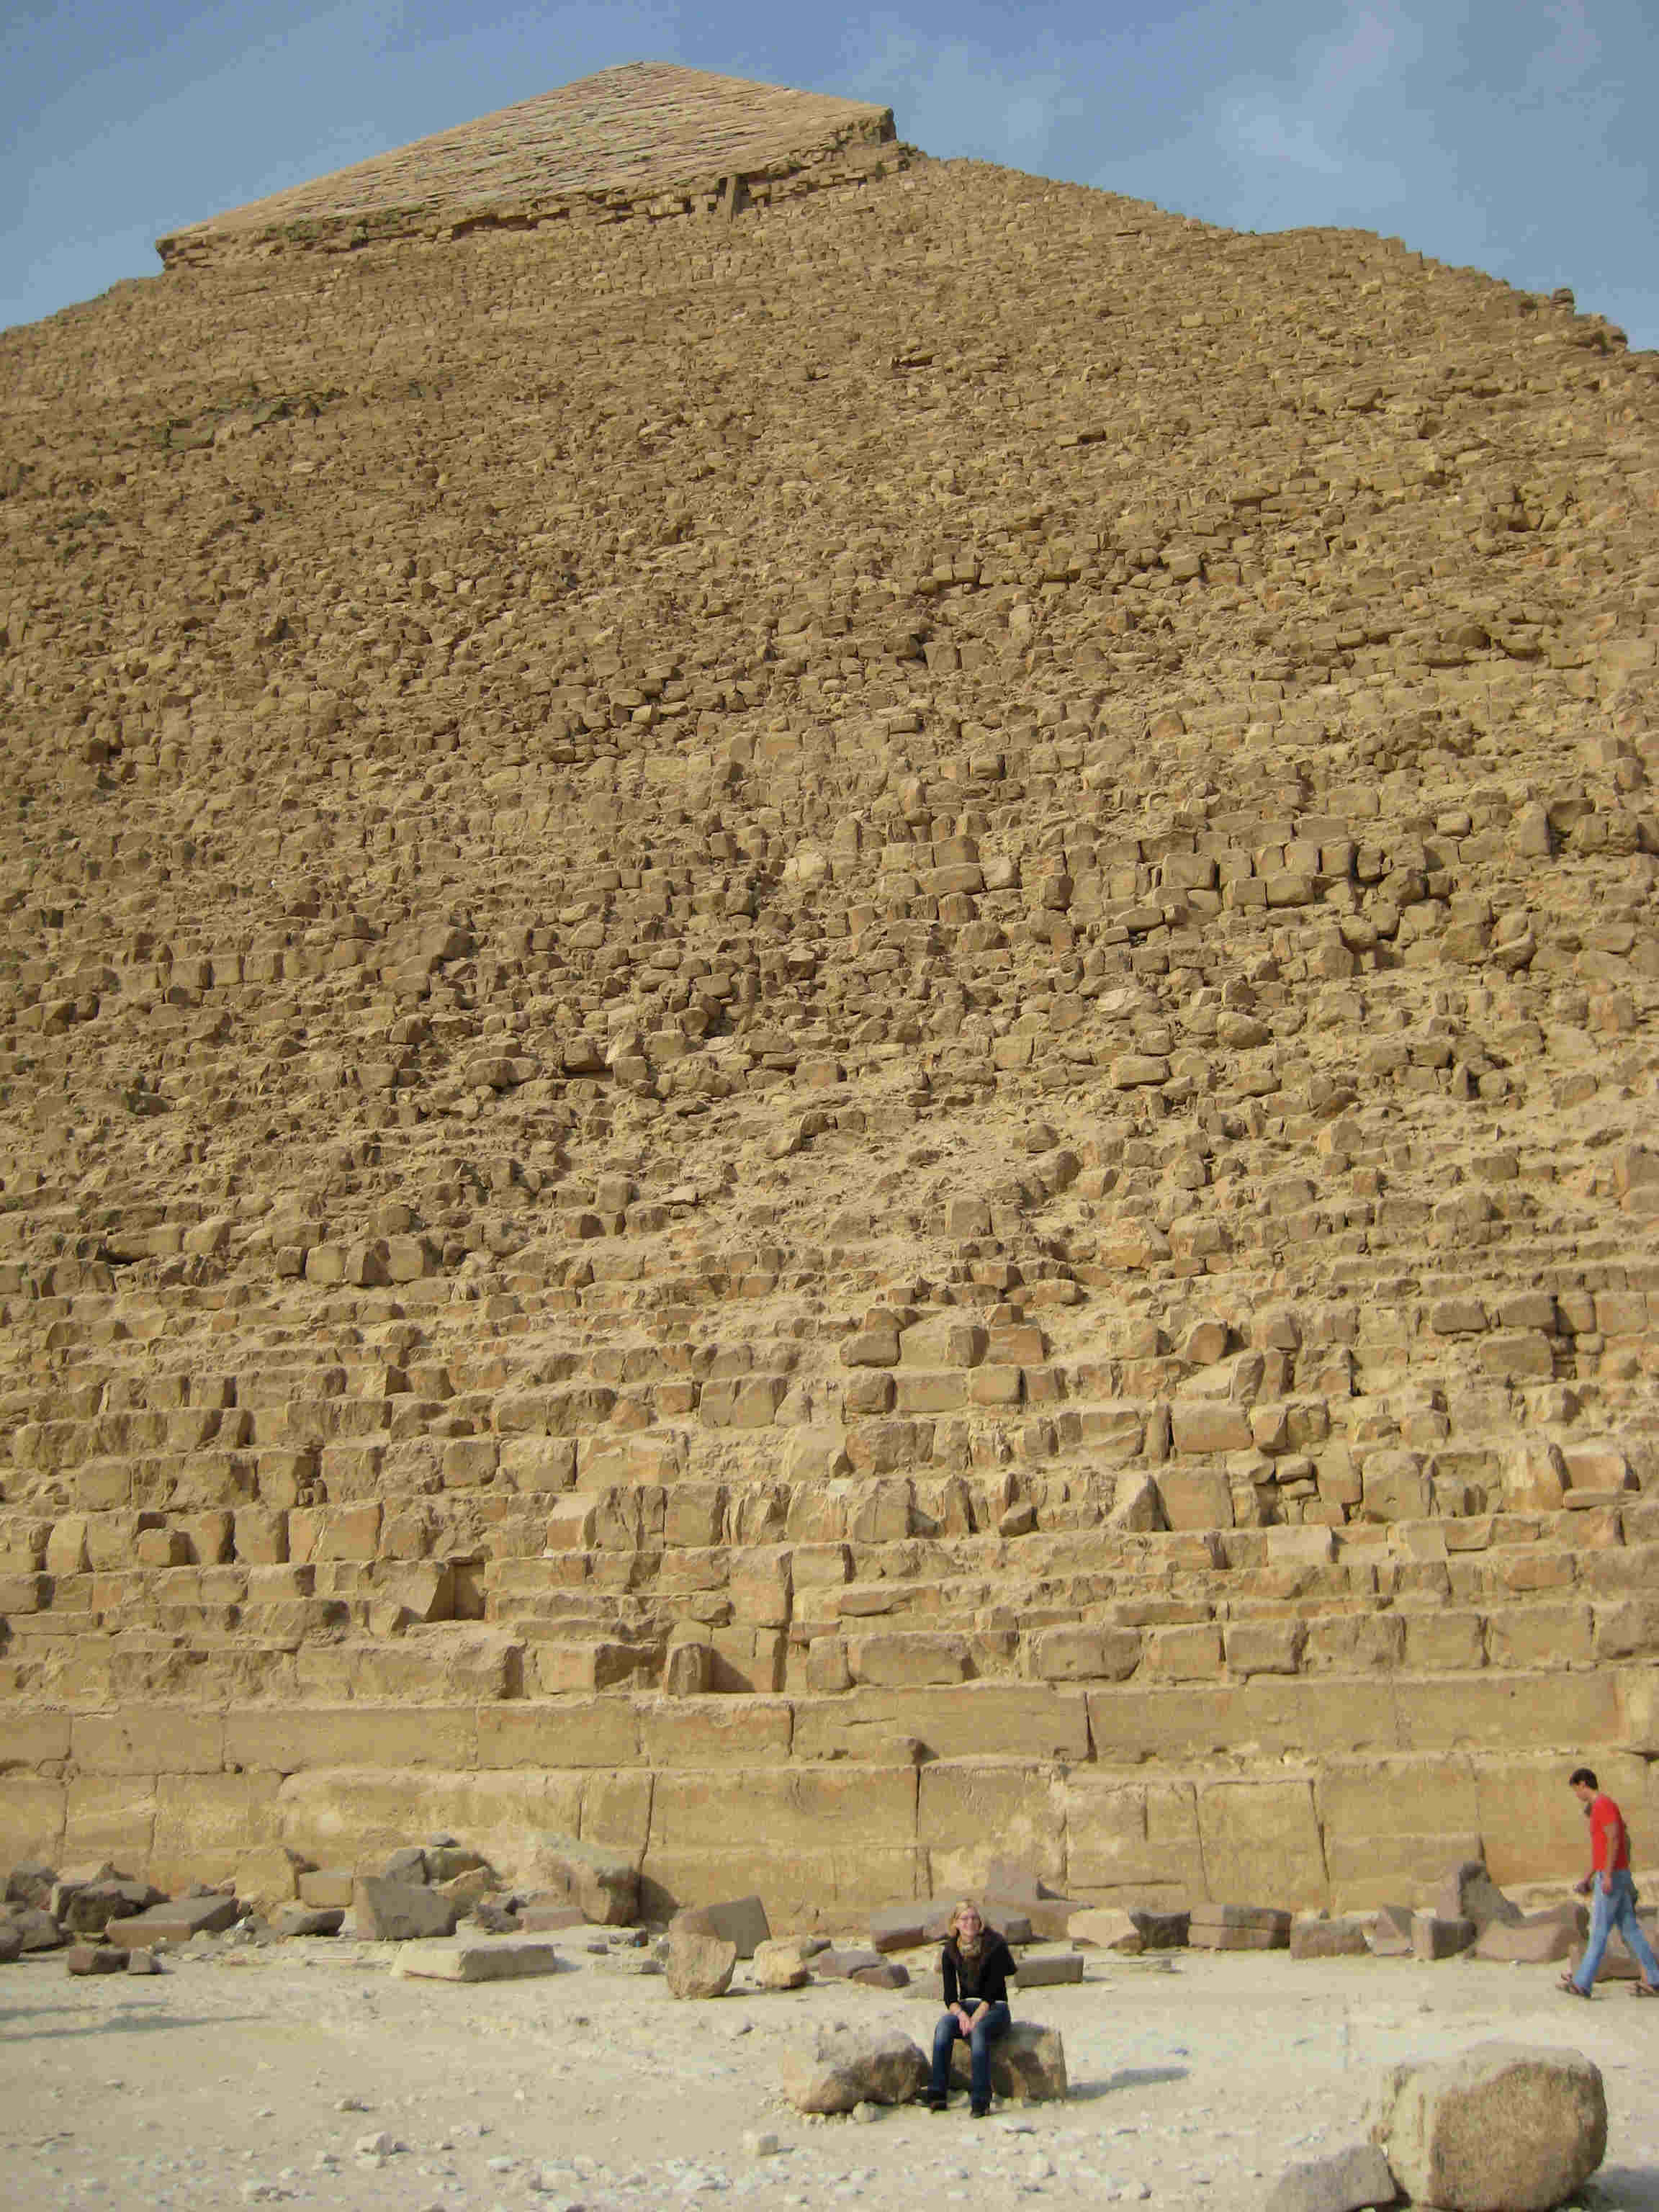 Wann Wurde Die Cheops Pyramide Gebaut